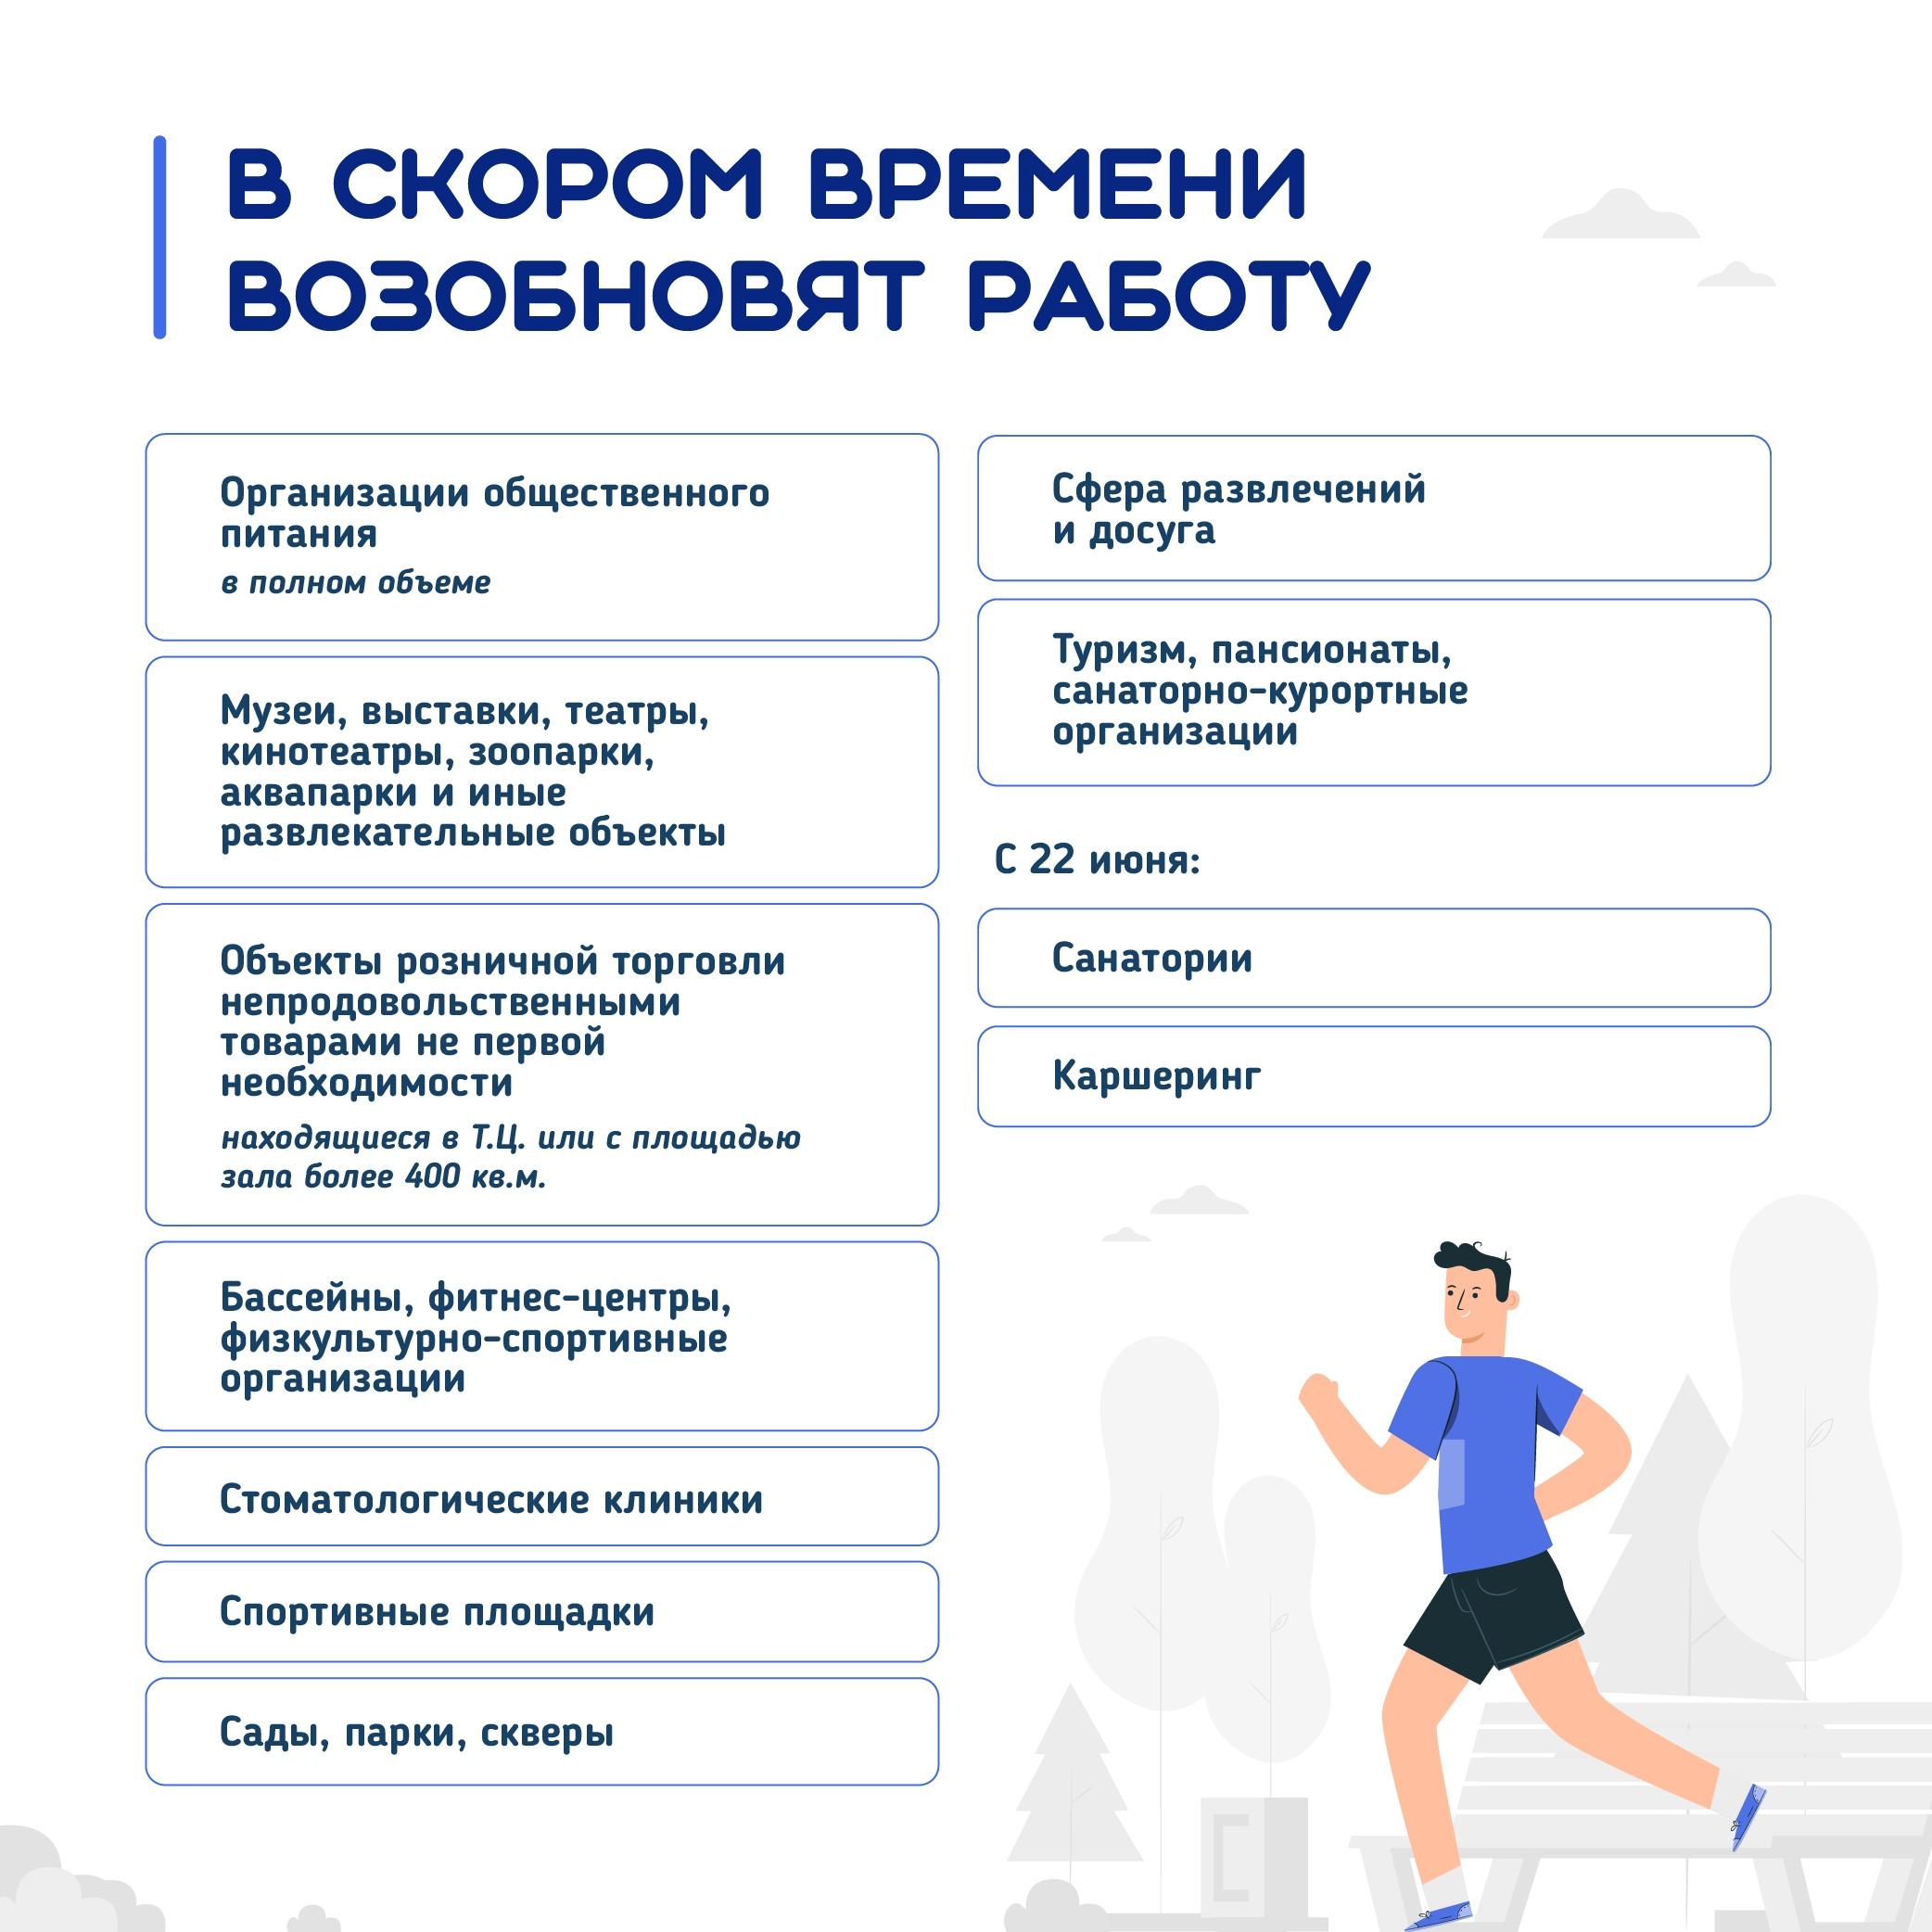 "Инфографика&nbsp;<a href=""https://vk.com/a_beglov"" class=""_"">vk.com/a_beglov</a>"